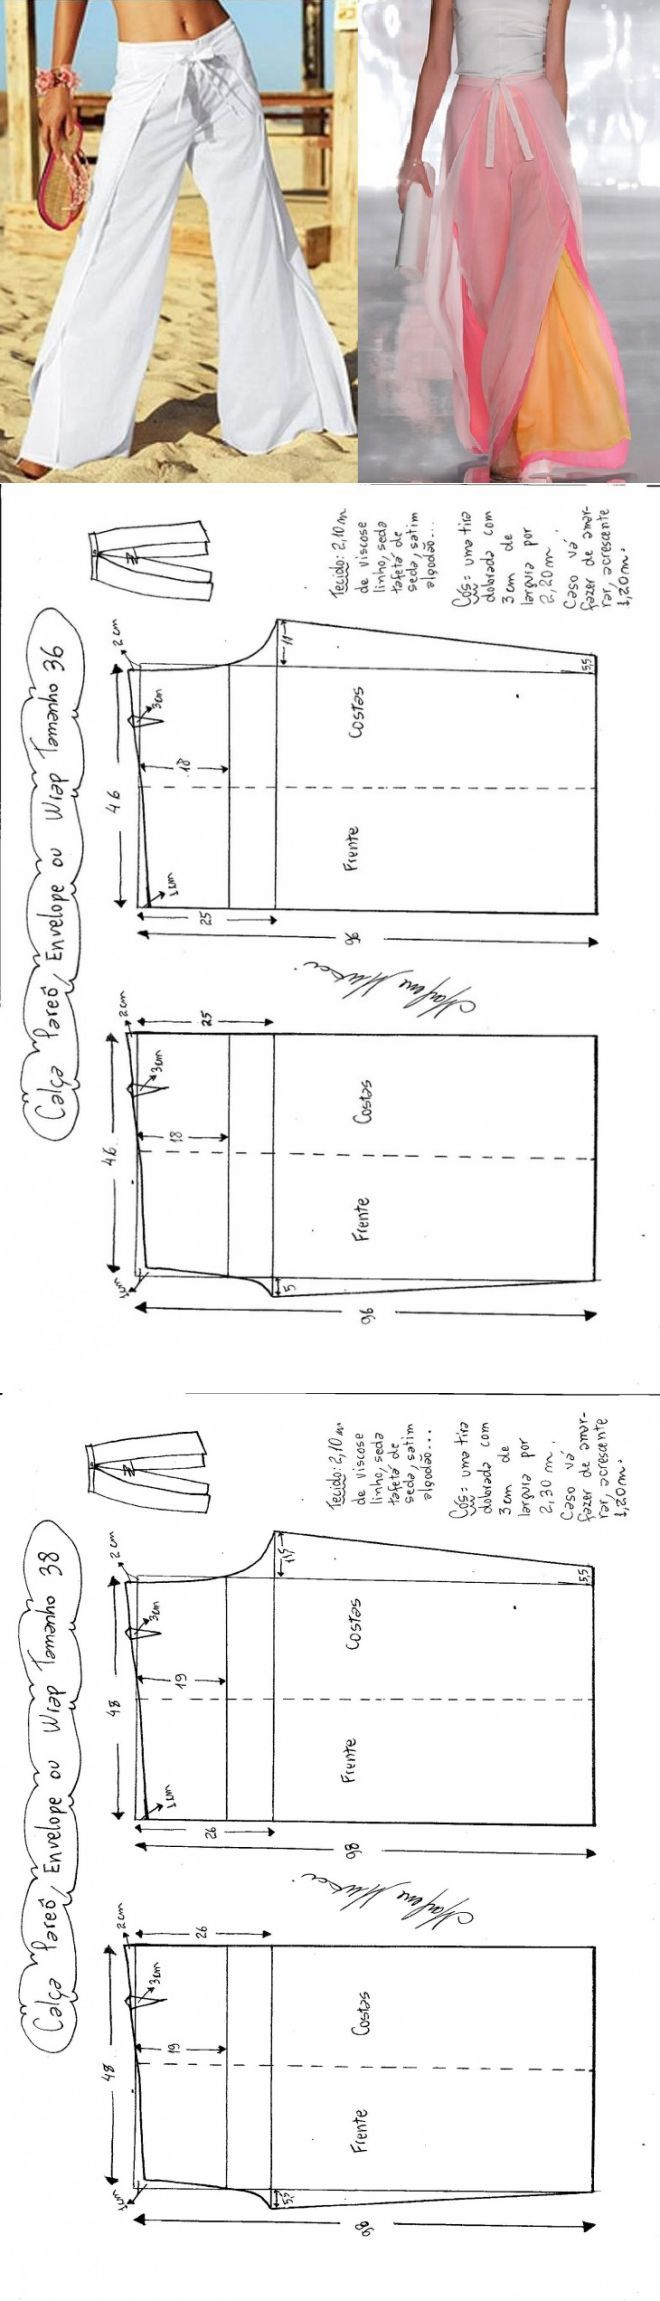 ♥ Moldes ♥ | costura | Pinterest | Costura, Pantalones and Moldes